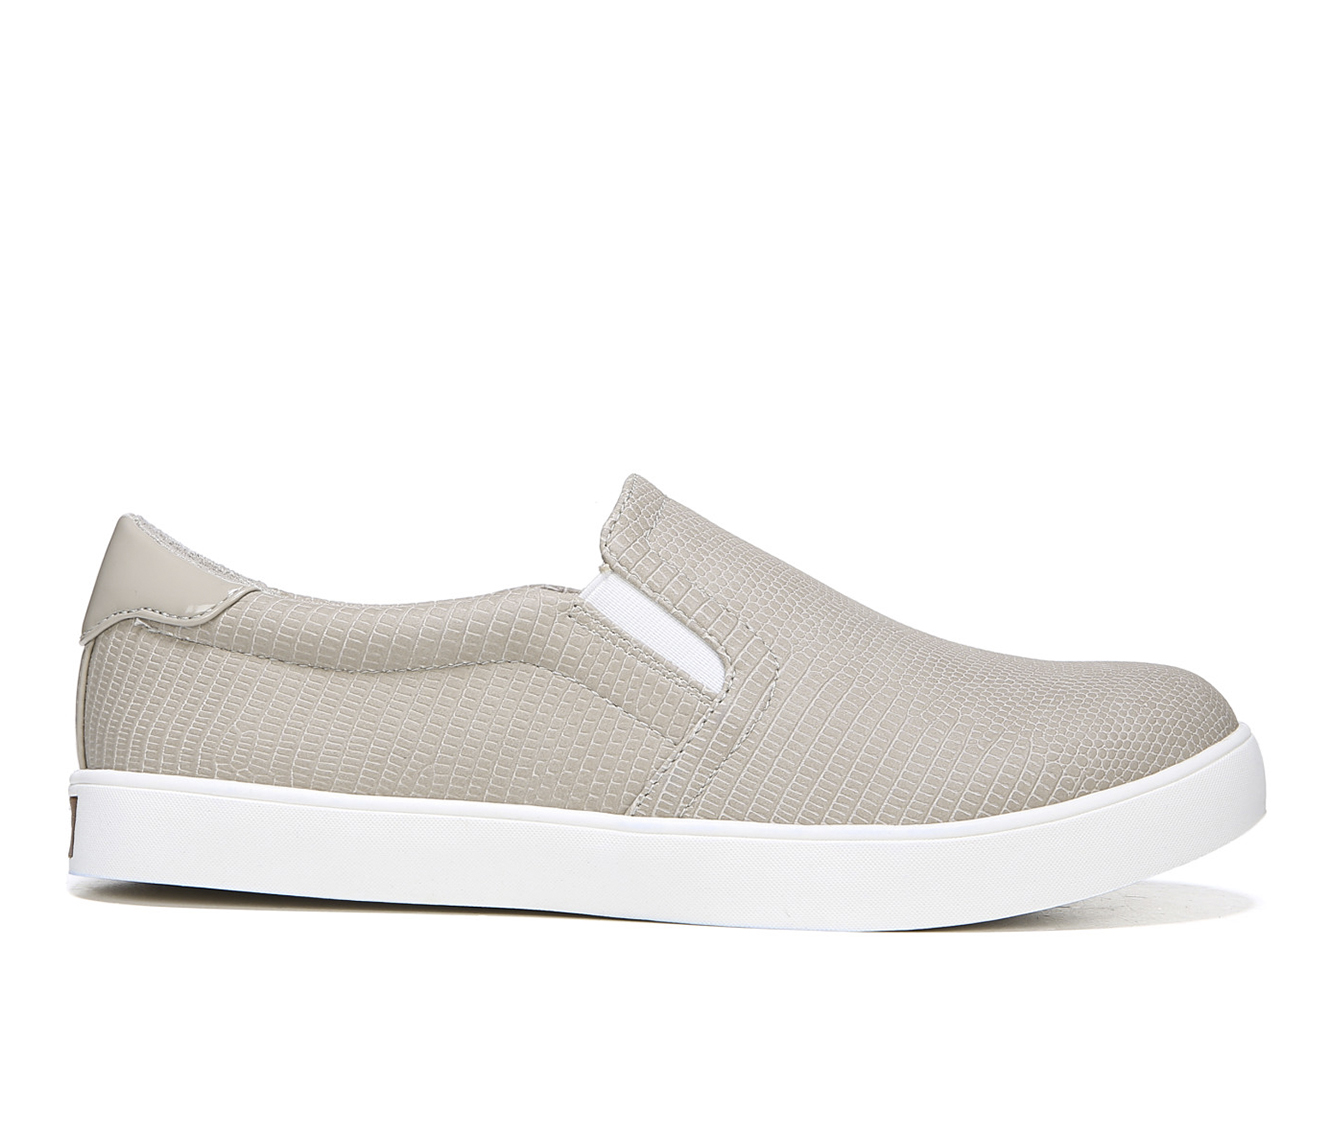 Dr. Scholls Madison Women's Shoe (Beige Faux Leather)